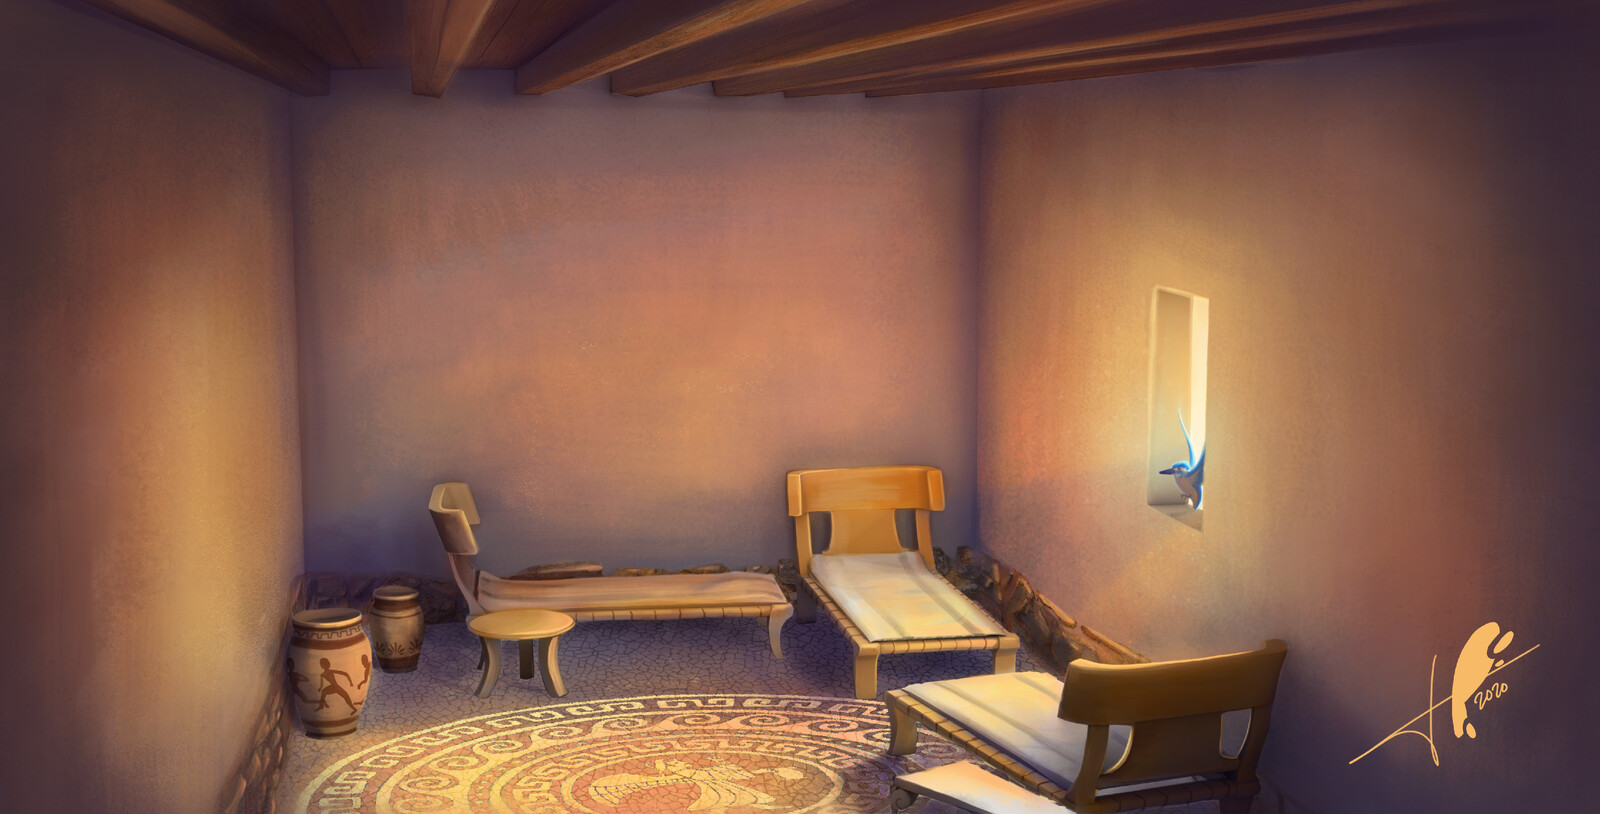 """Ancient Greece room"" -Concept Art"